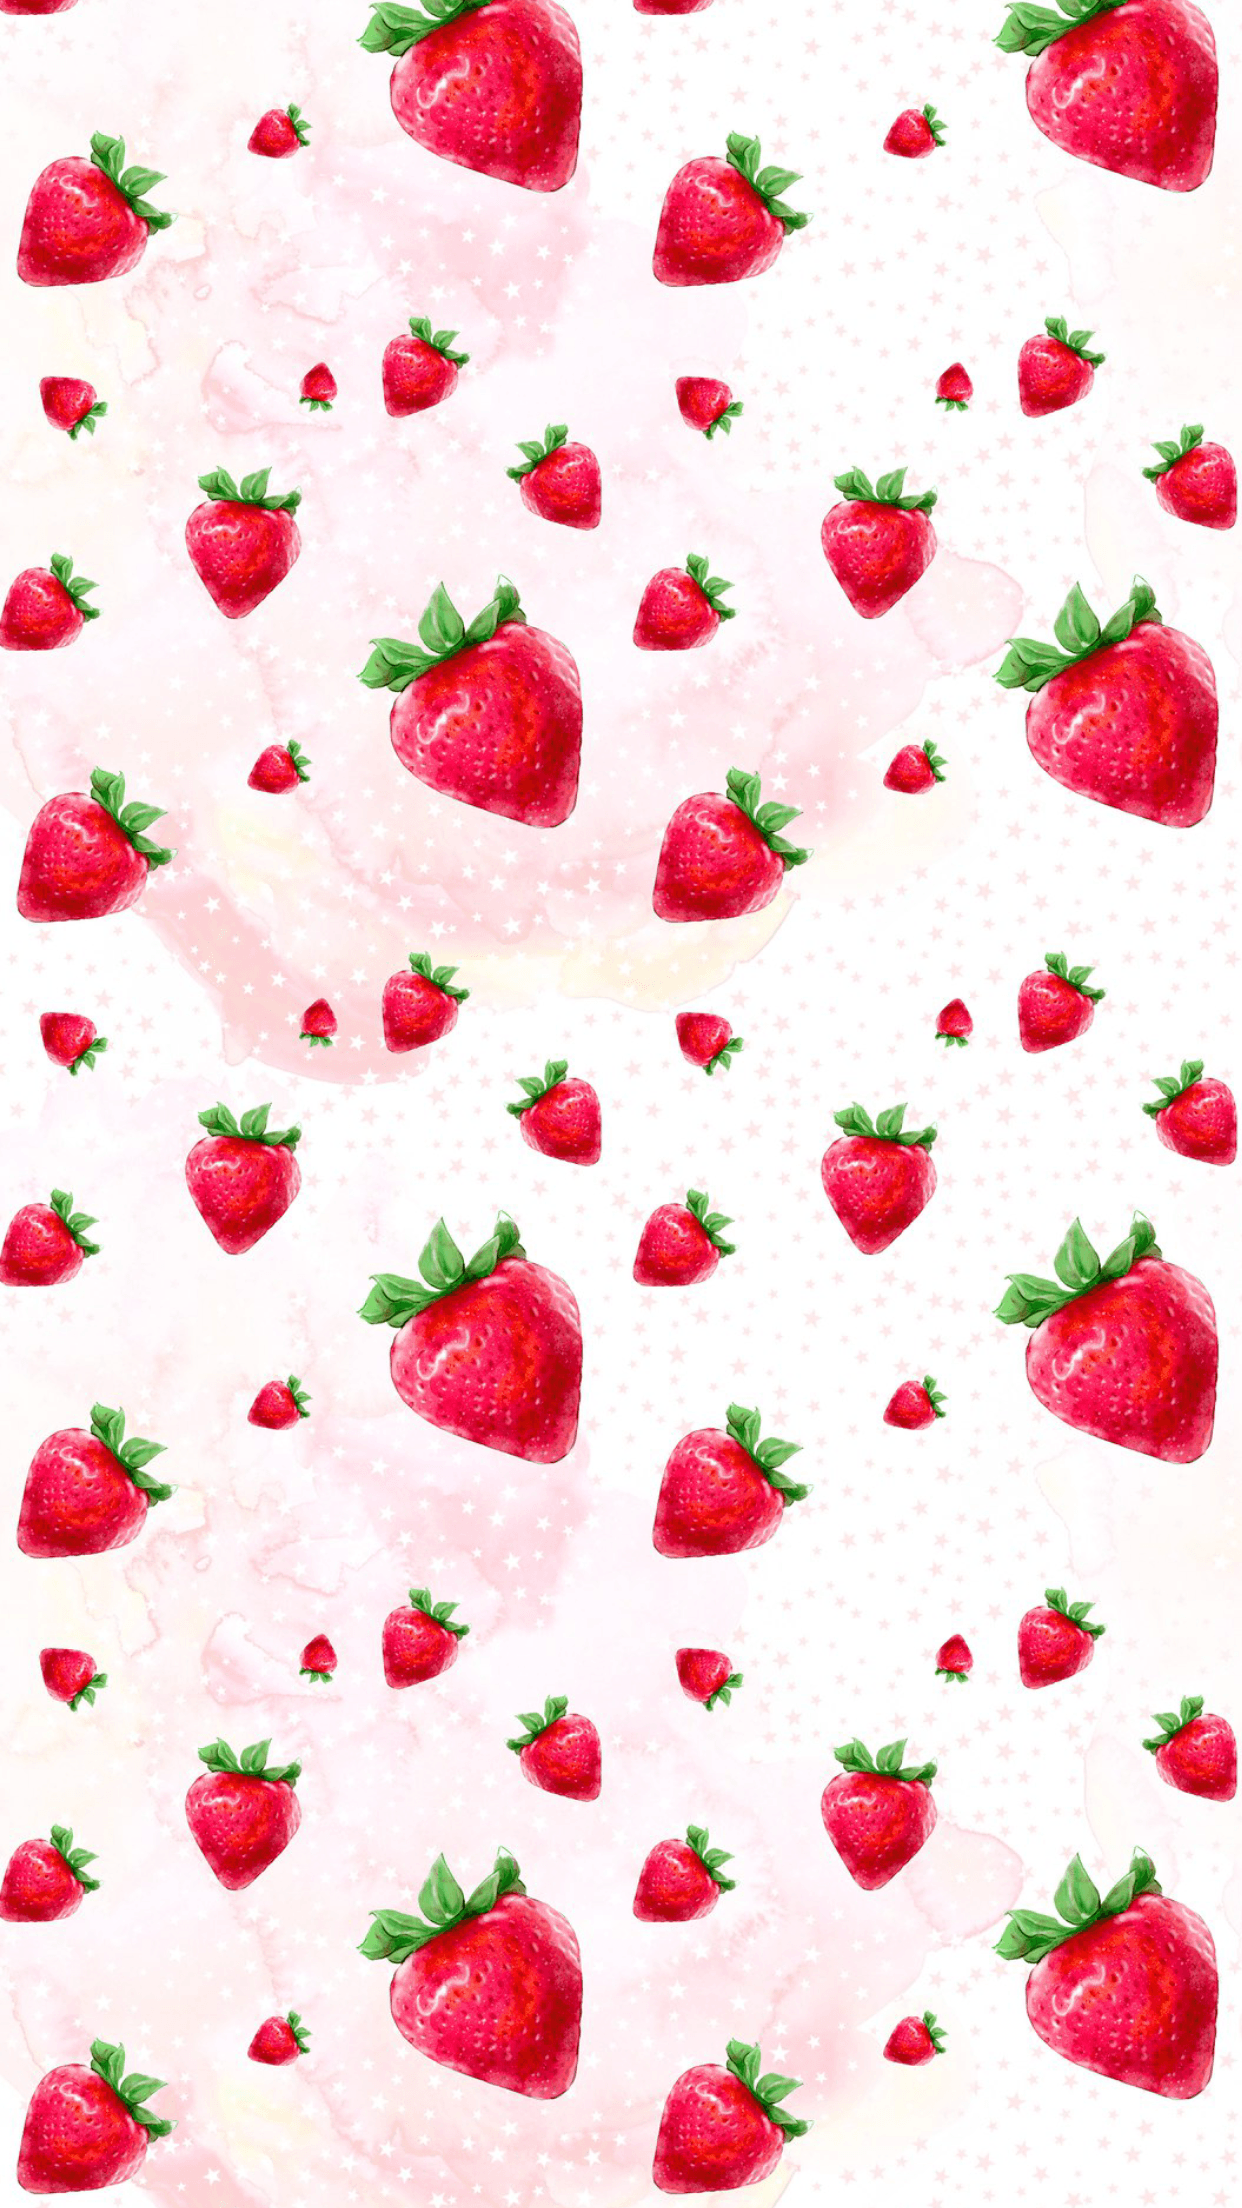 Kawaii Strawberry Wallpapers Wallpaper Cave